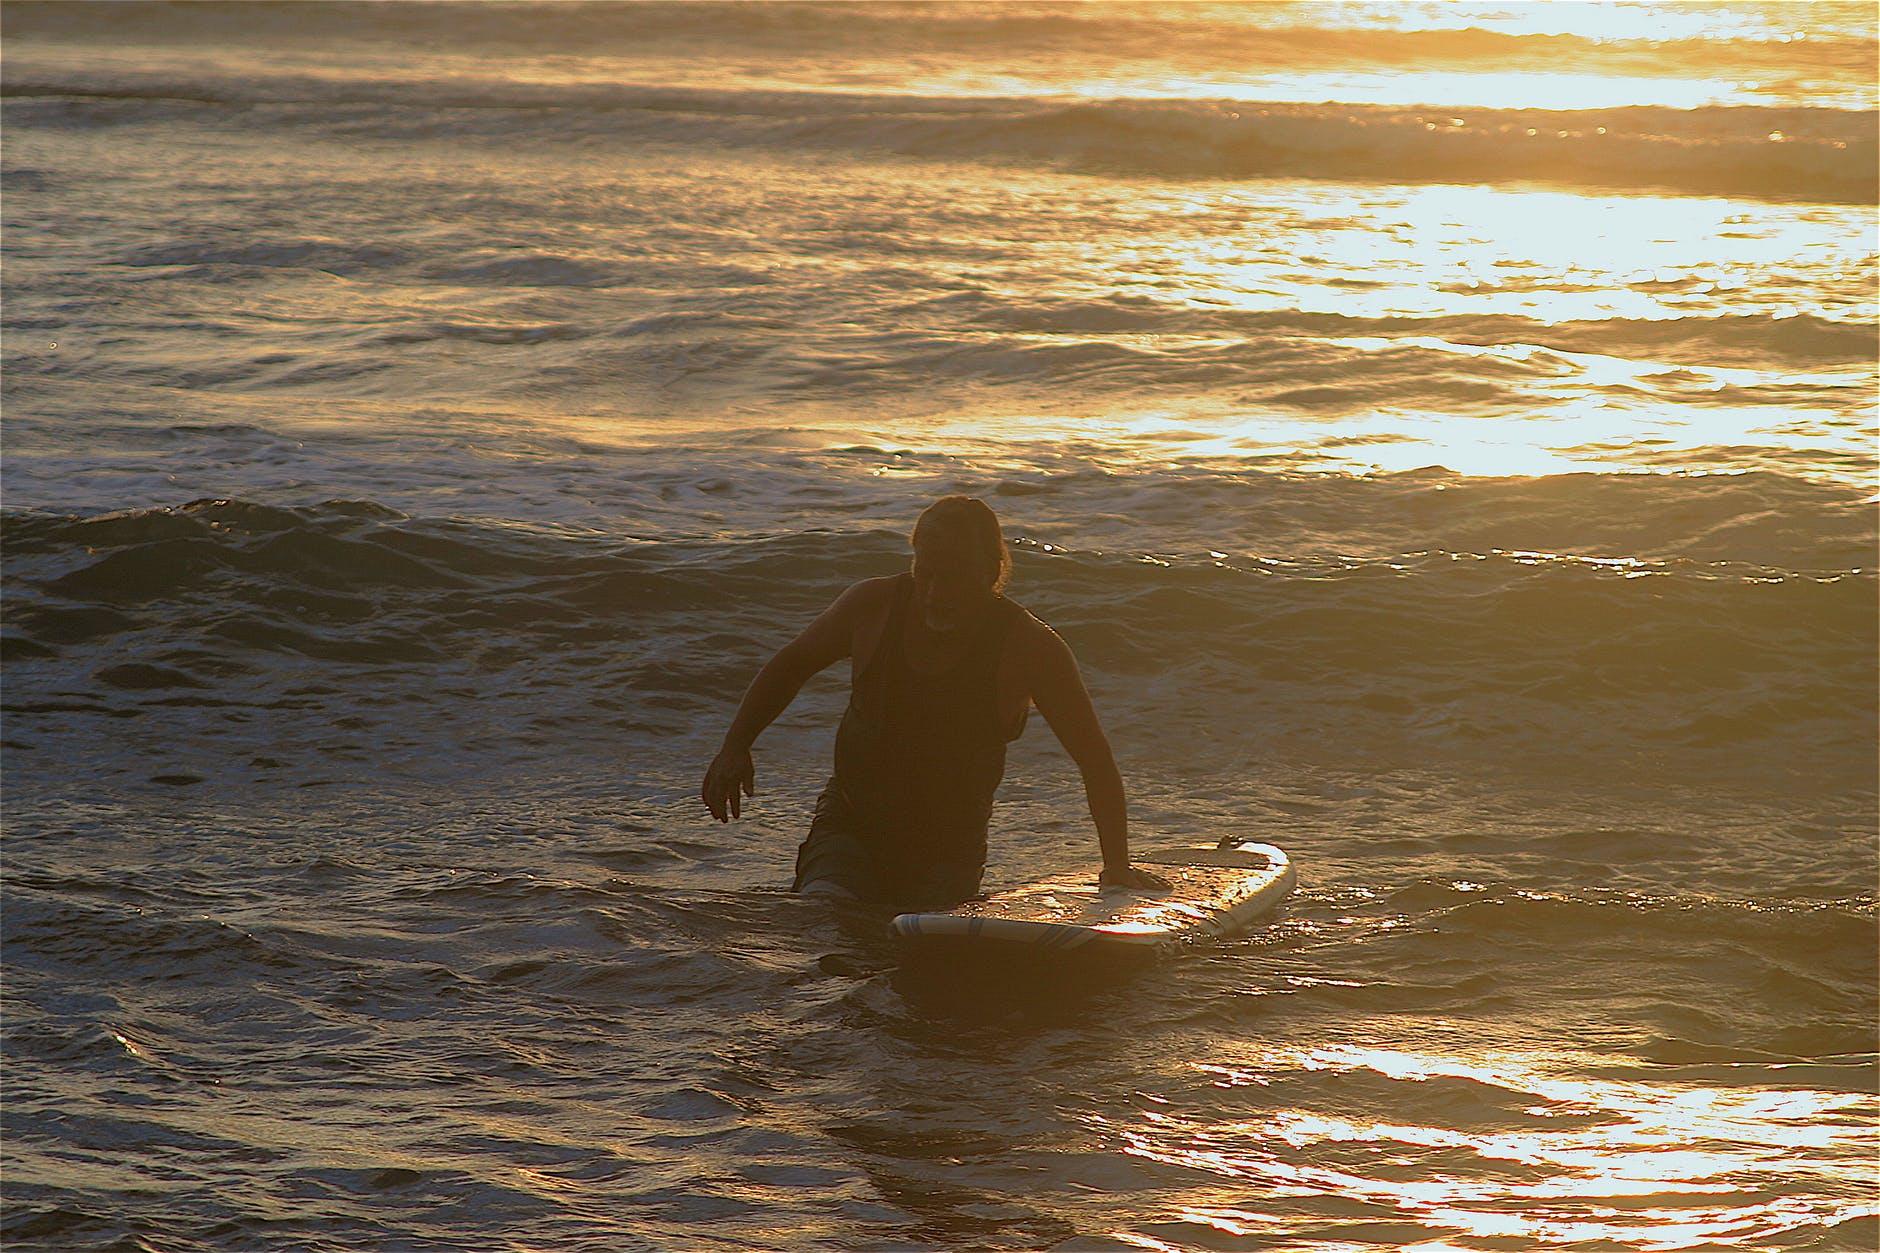 tabla surfear